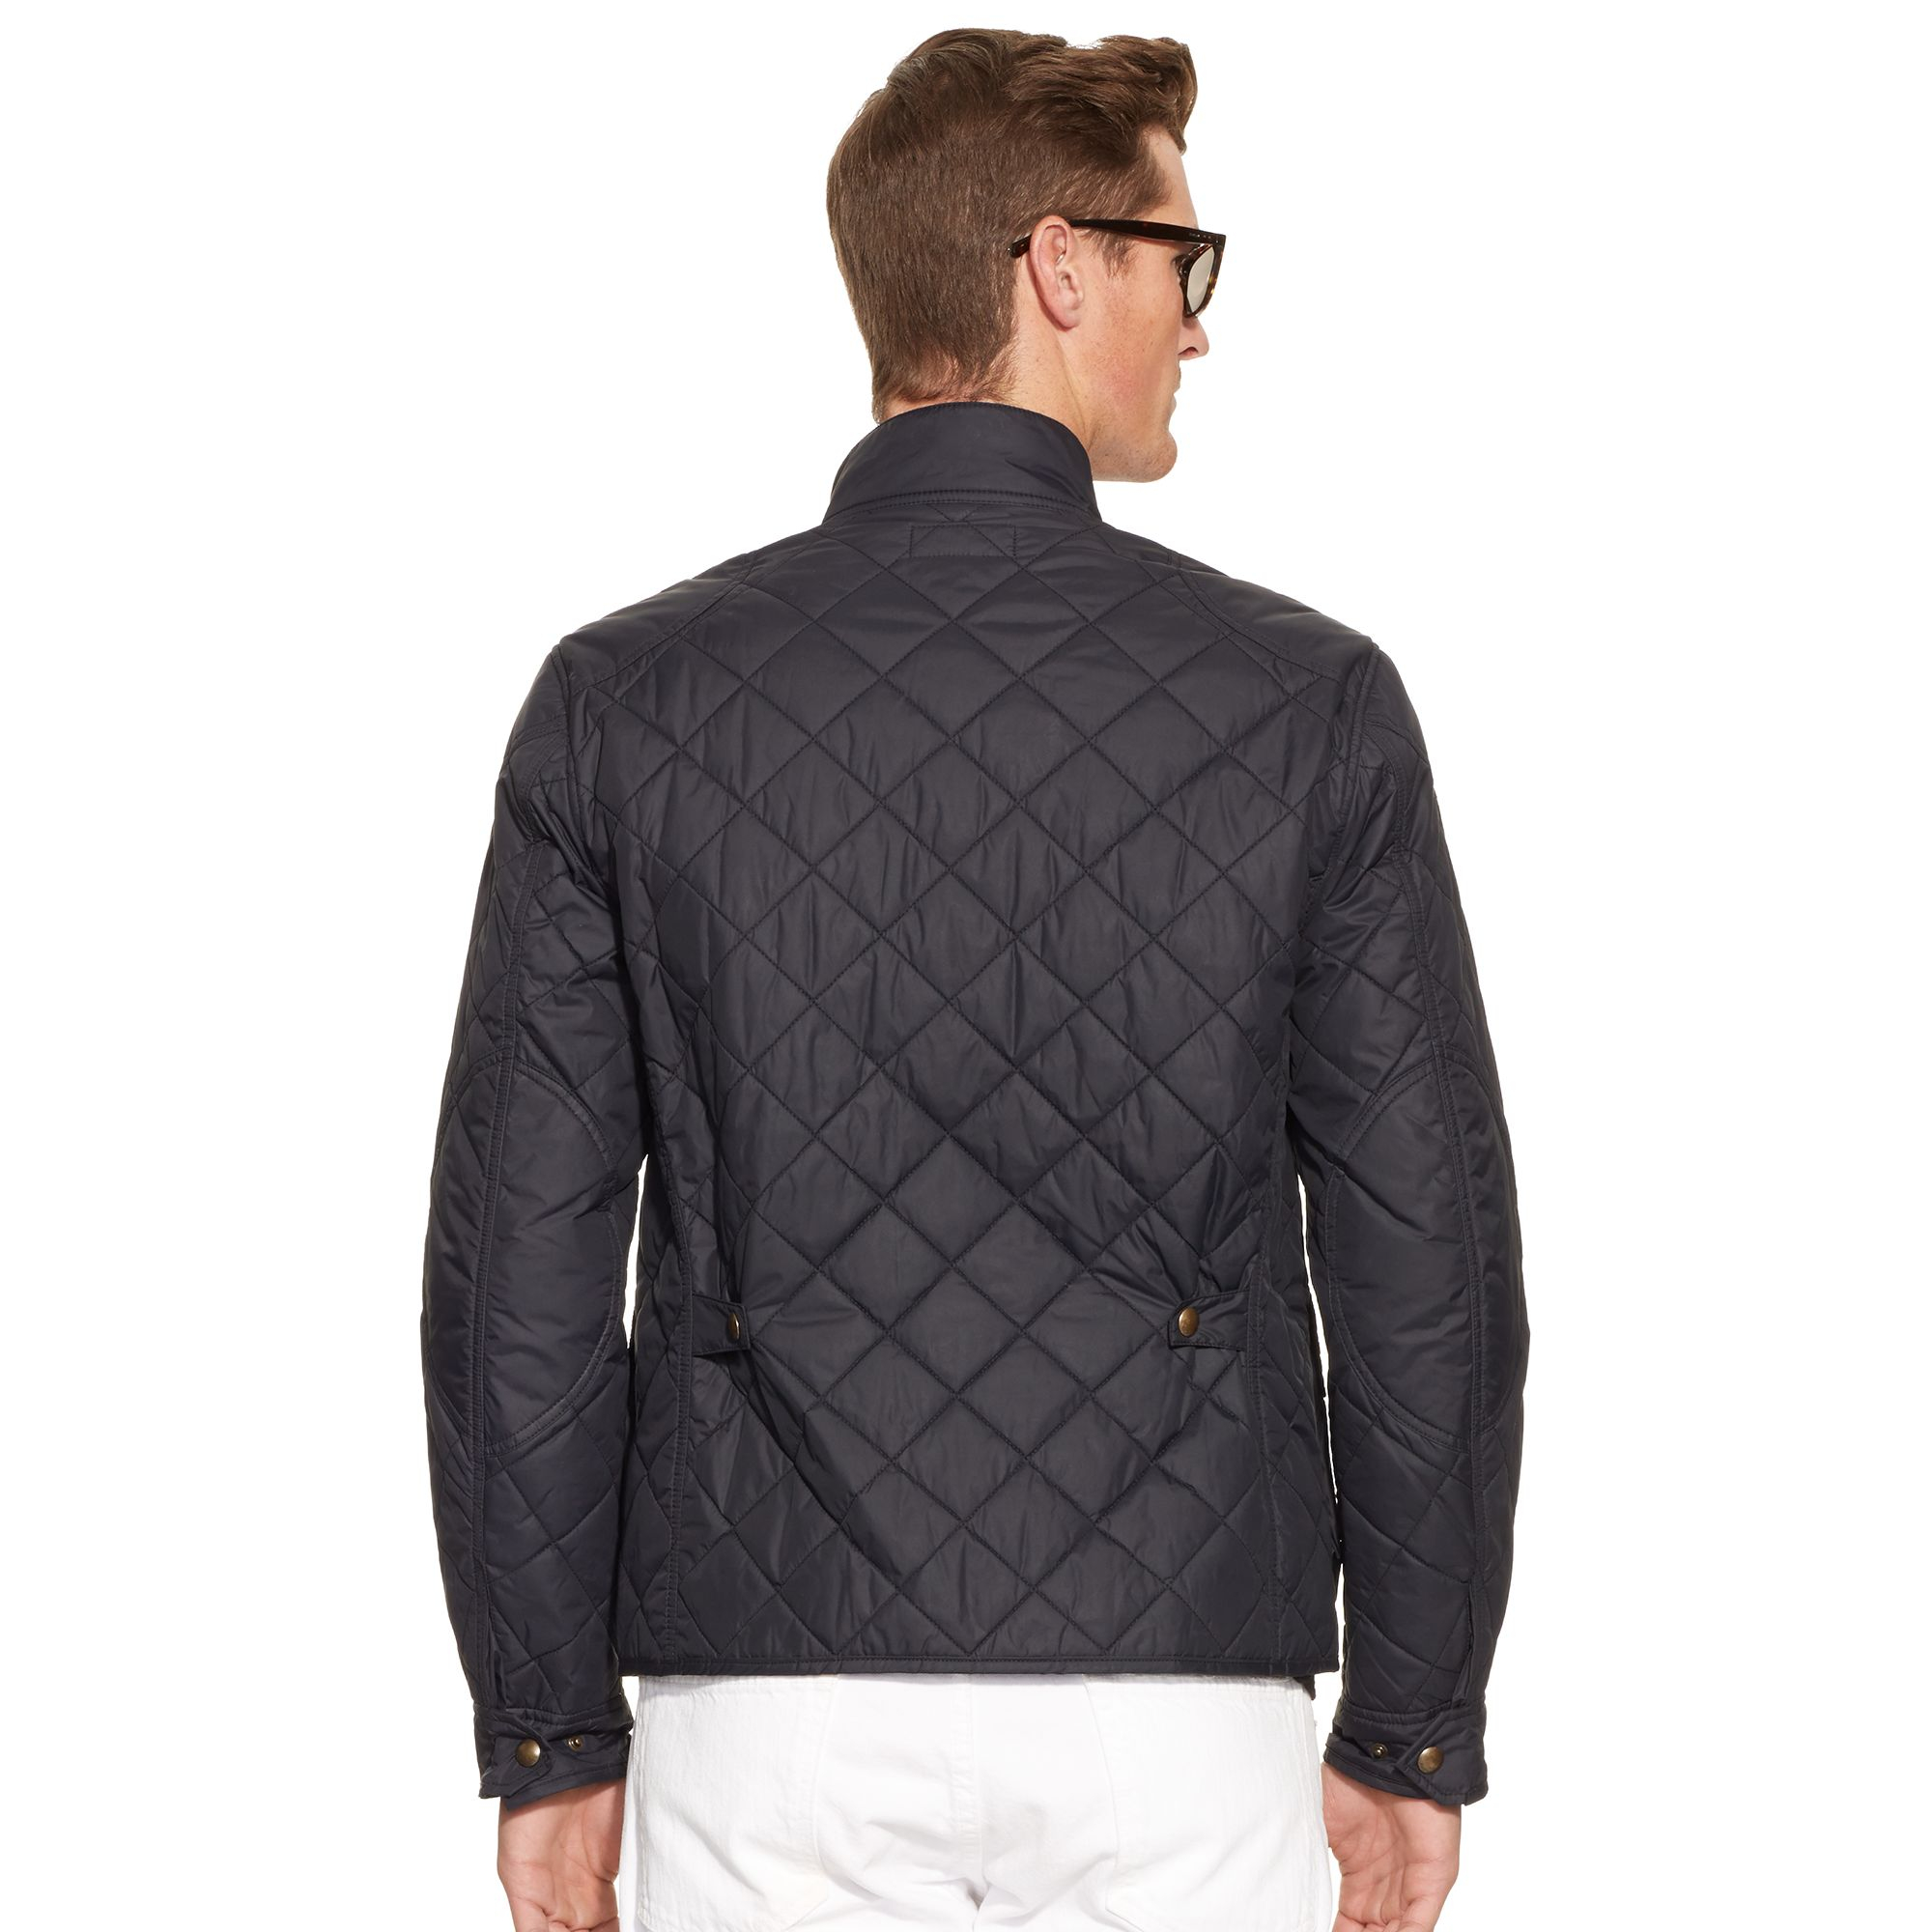 North Face Apex Bionic Jacket Men S